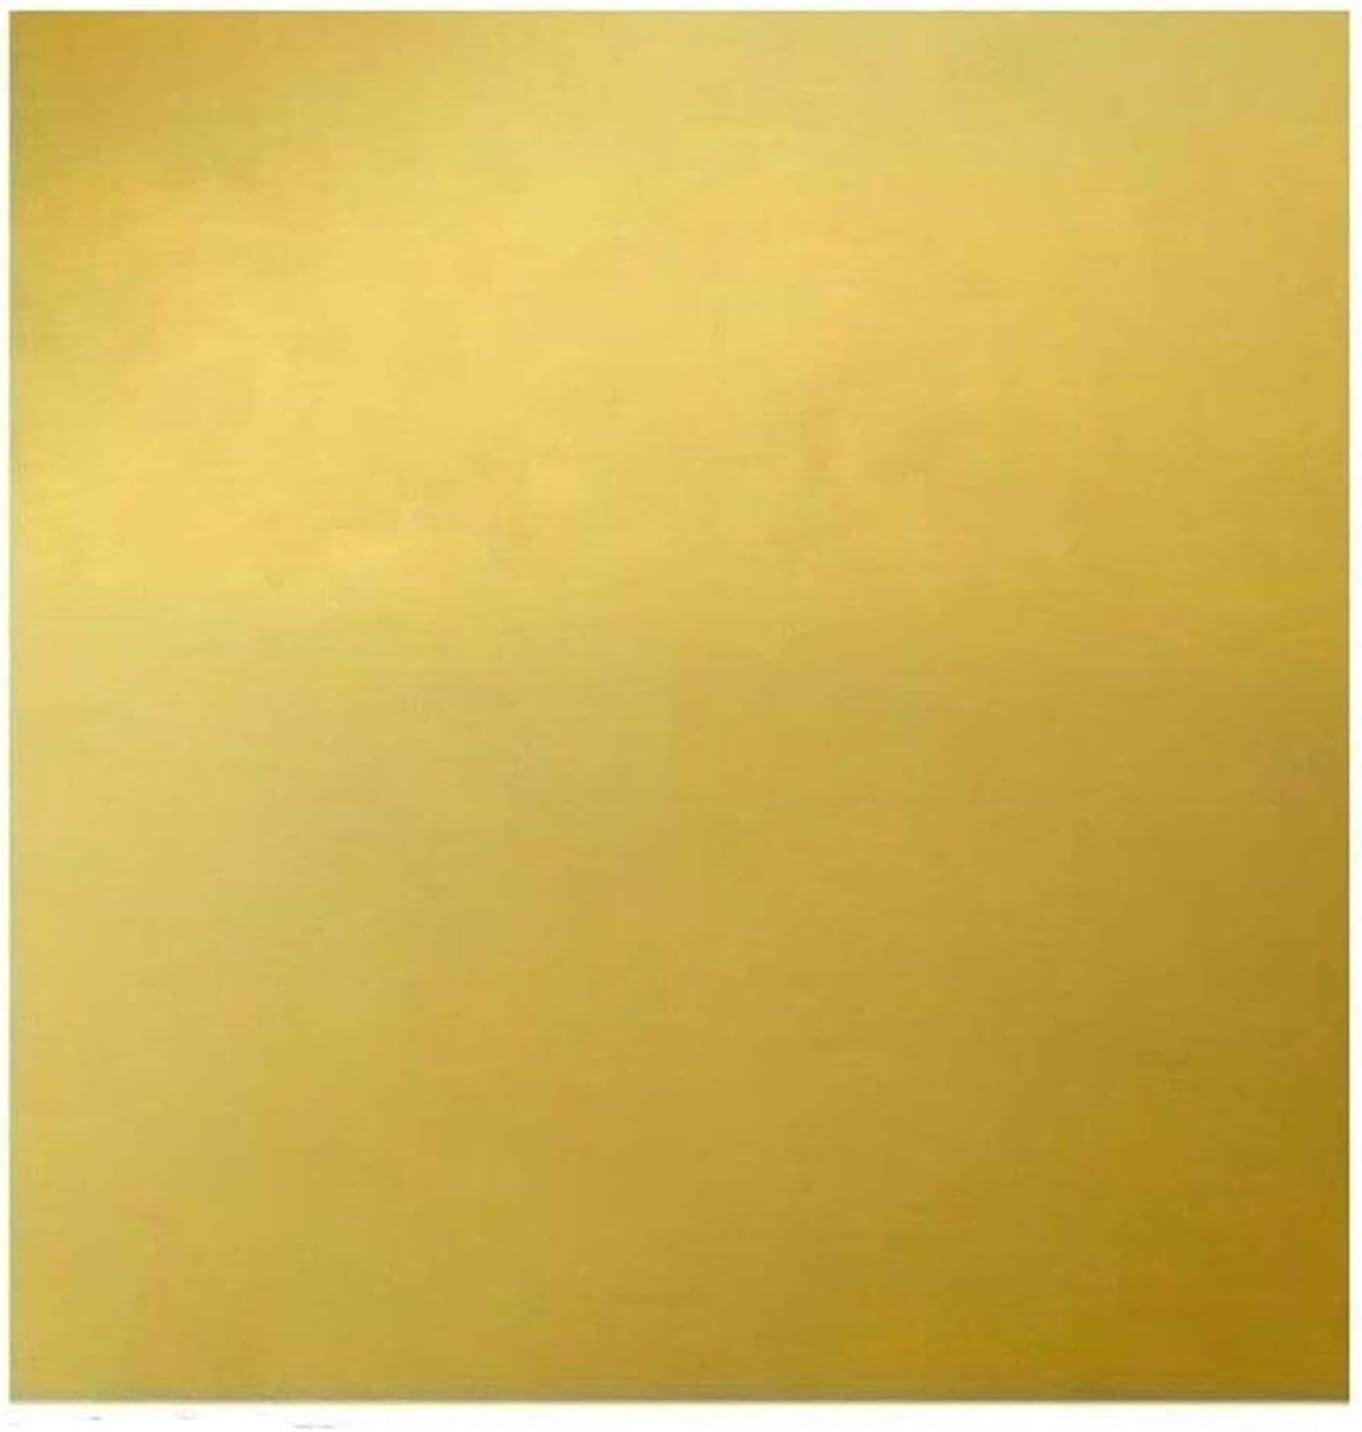 Wzqwzj Brass Topics on TV Sheet 1.5mm Metalwo for Popular brand in the world 100mm x